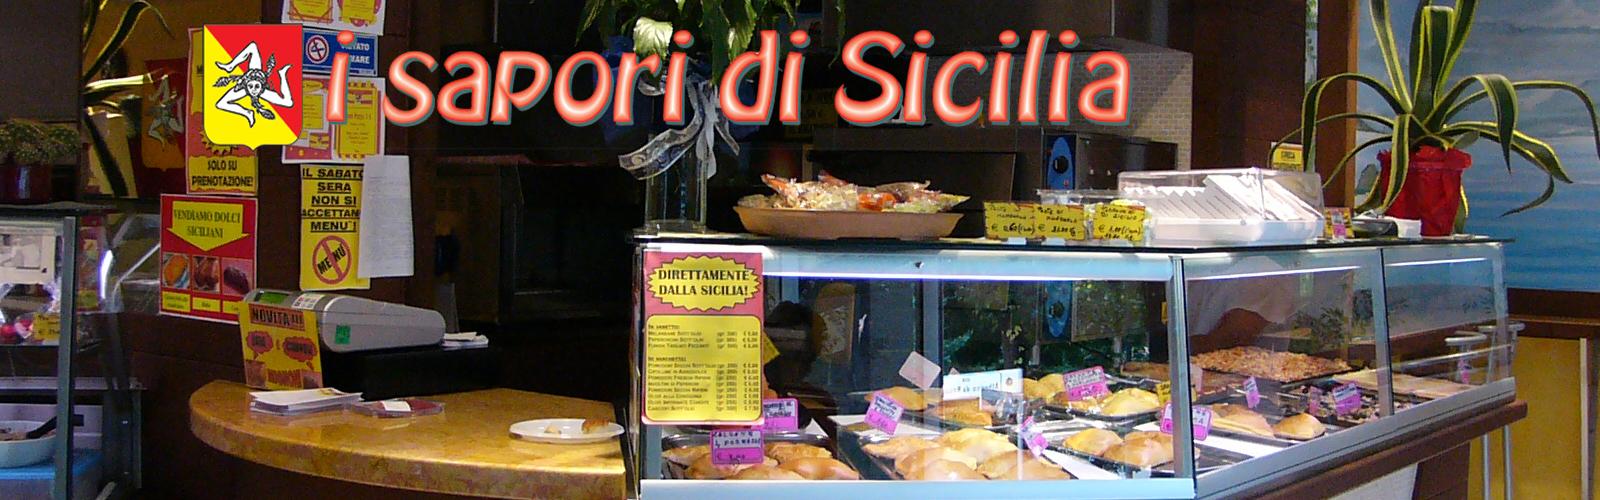 foodeez-default-slider-image